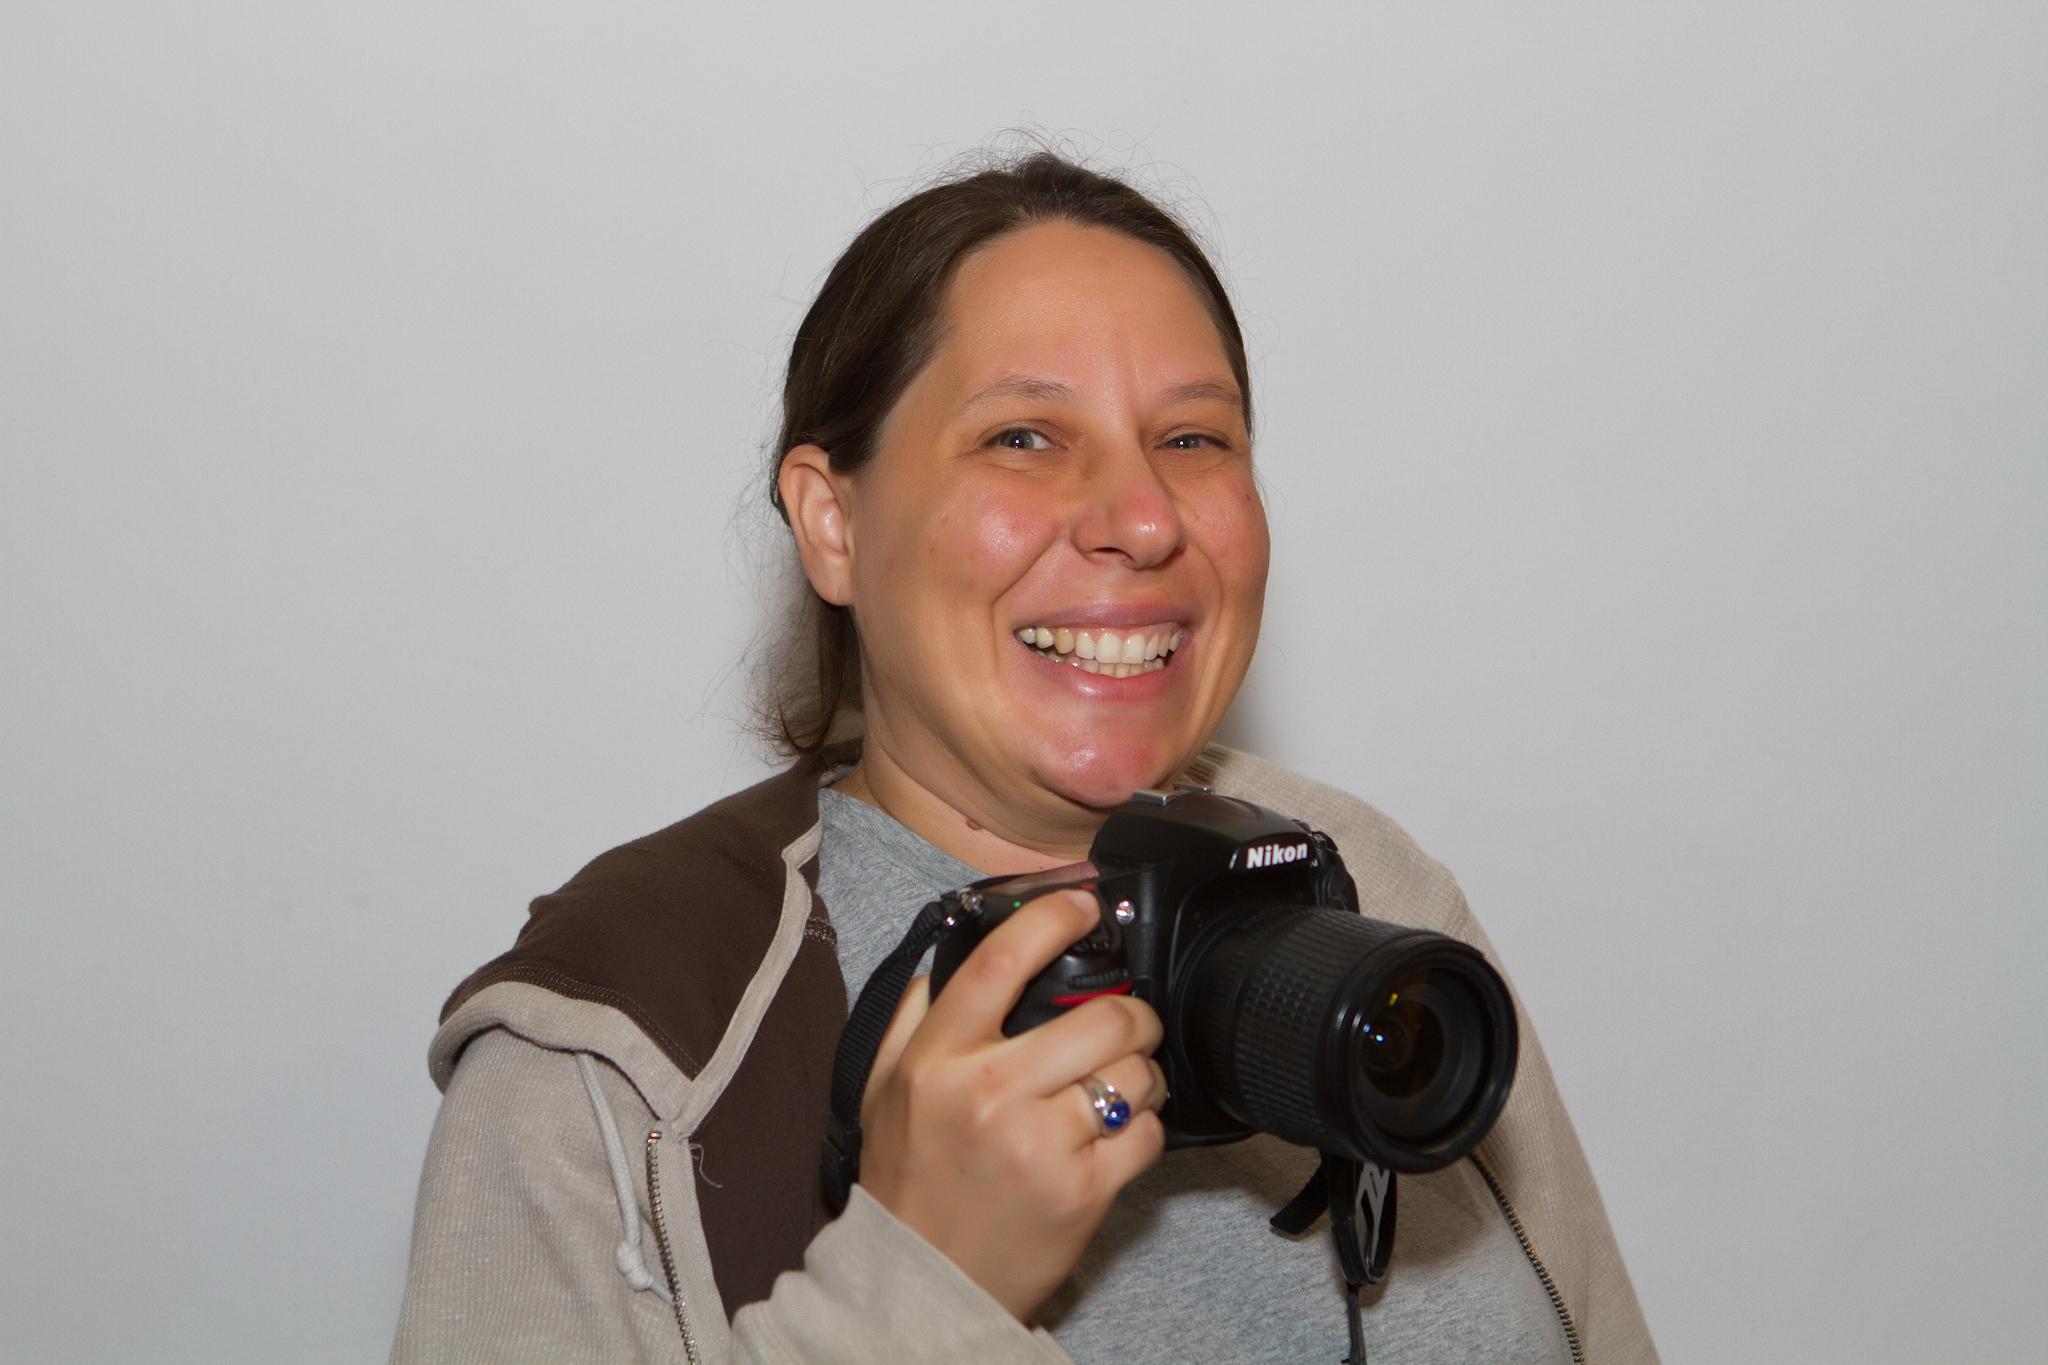 Image of Zoe Strauss from Wikidata